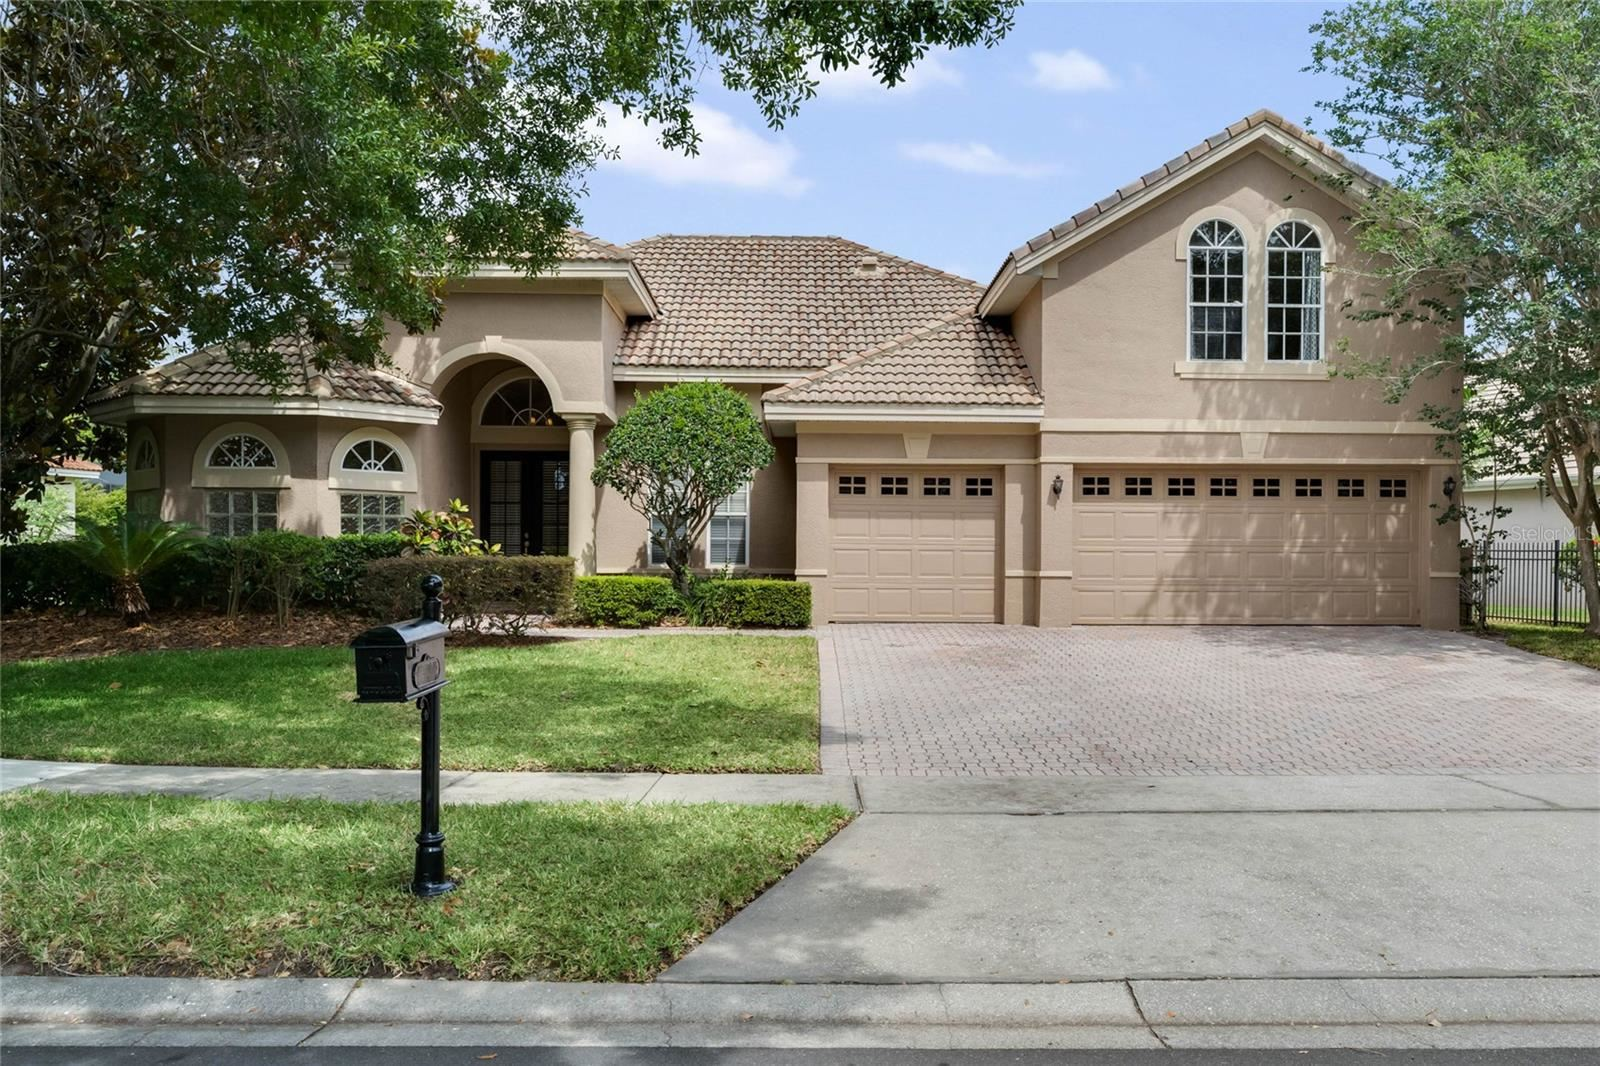 8942 HERITAGE BAY CIRCLE, Orlando, FL 32836 - #: O5949343